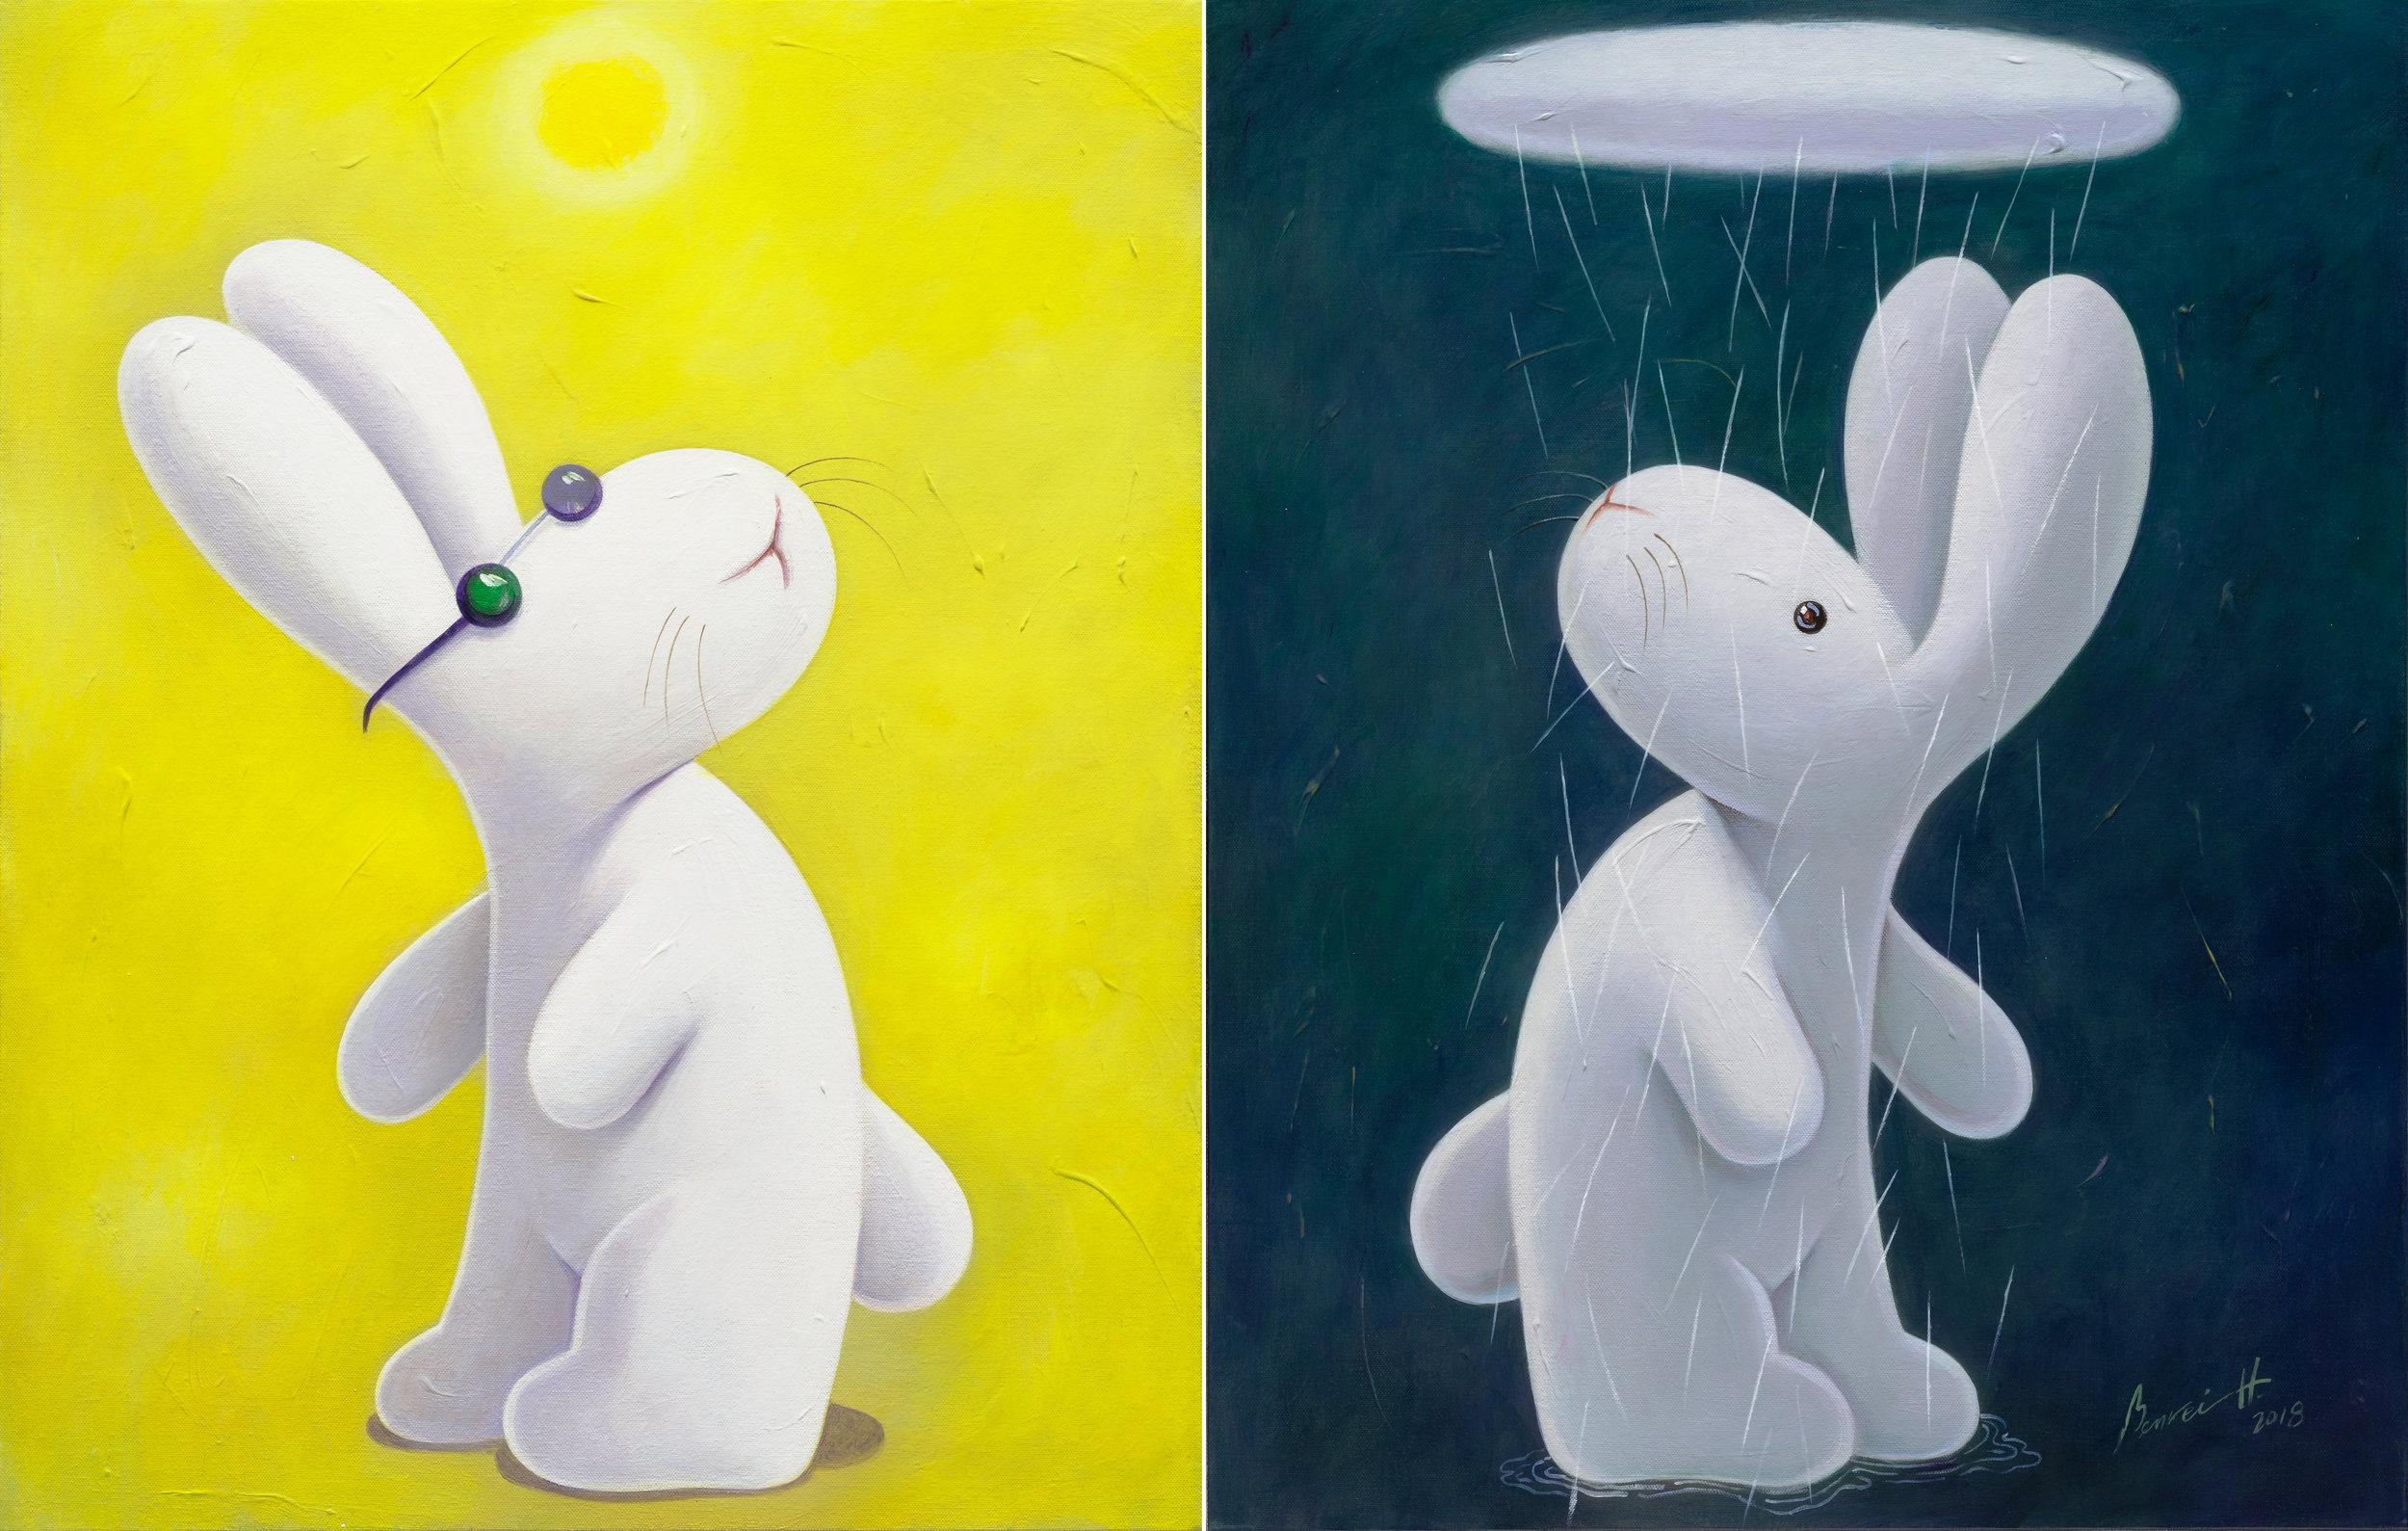 "My days of sun and rain 昨日豔陽今夜雨 今日豔陽昨夜雨,28x44""(71x112cm), acrylic on canvases, 2018"